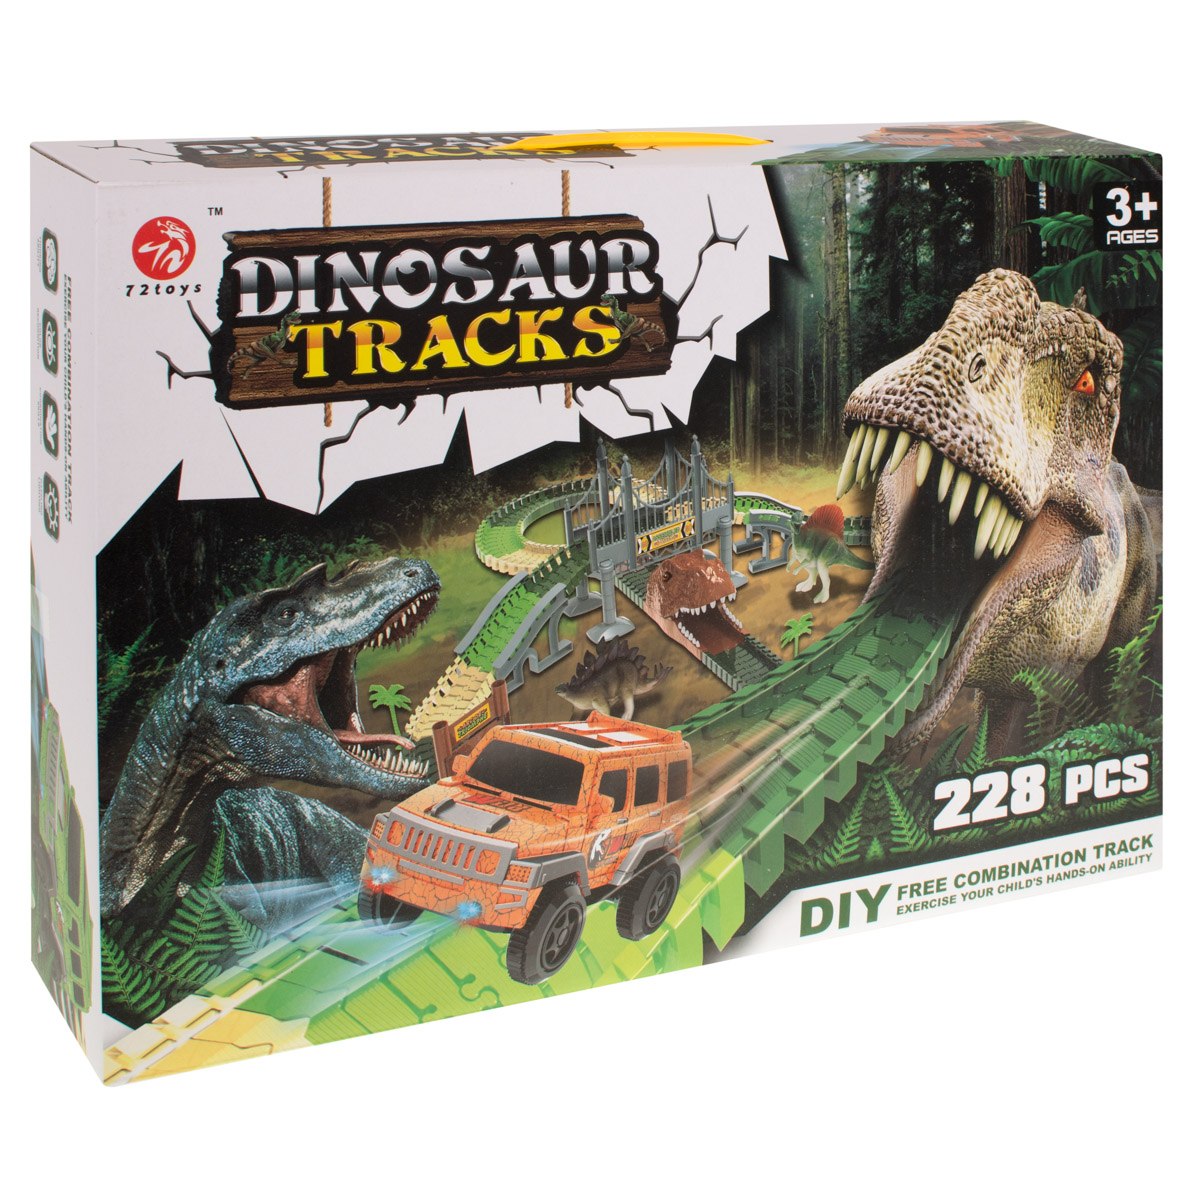 Autodráha s dinosaury, 228 dílů